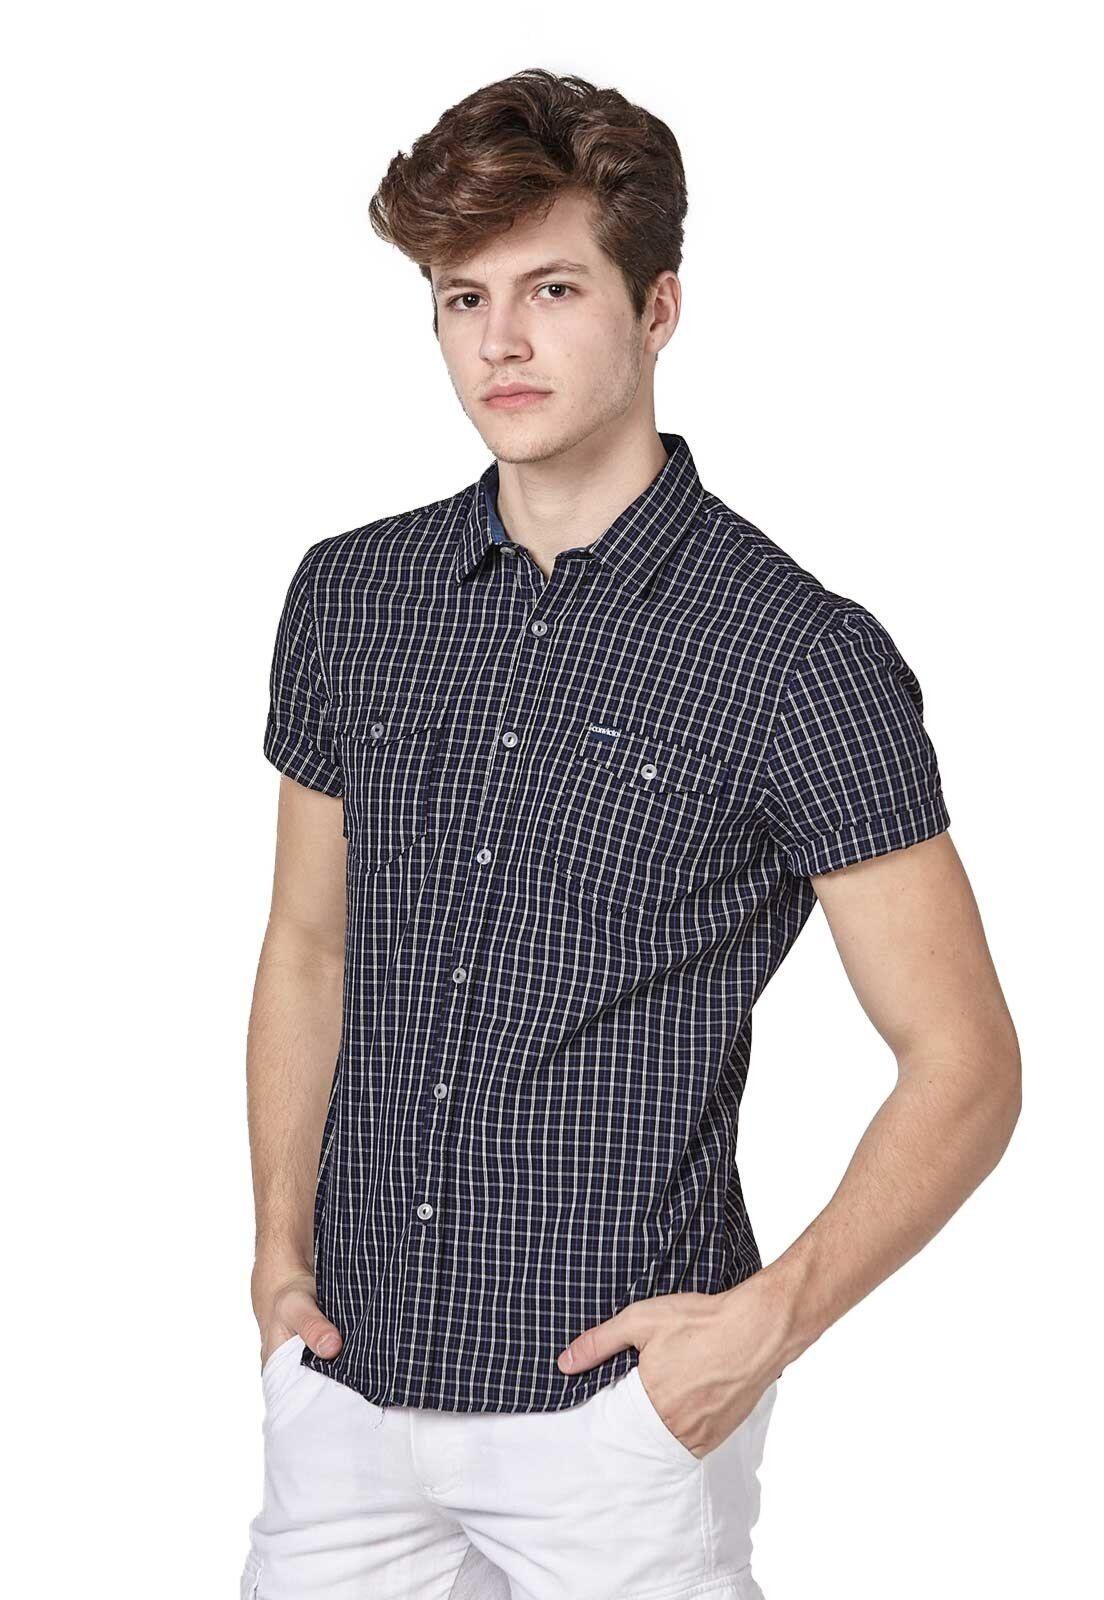 Camisa mangas curtas com estampa xadrez